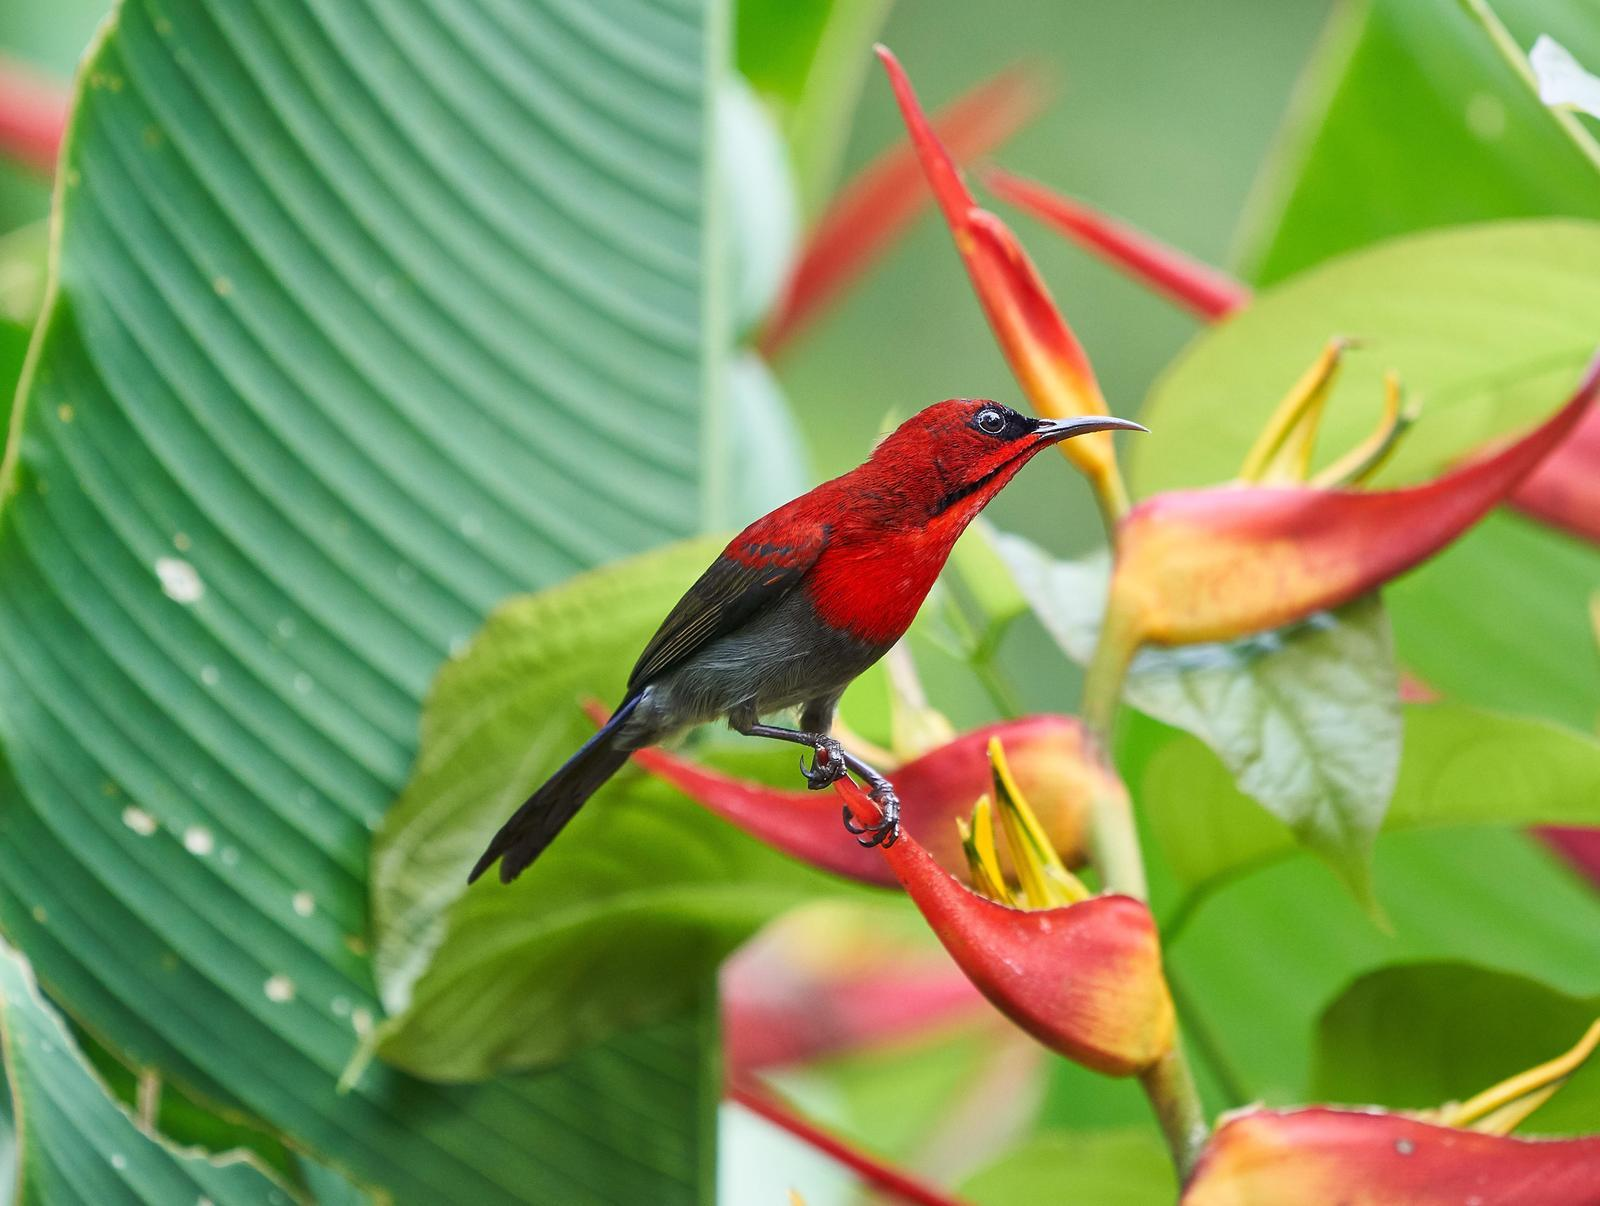 Crimson Sunbird Photo by Steven Cheong